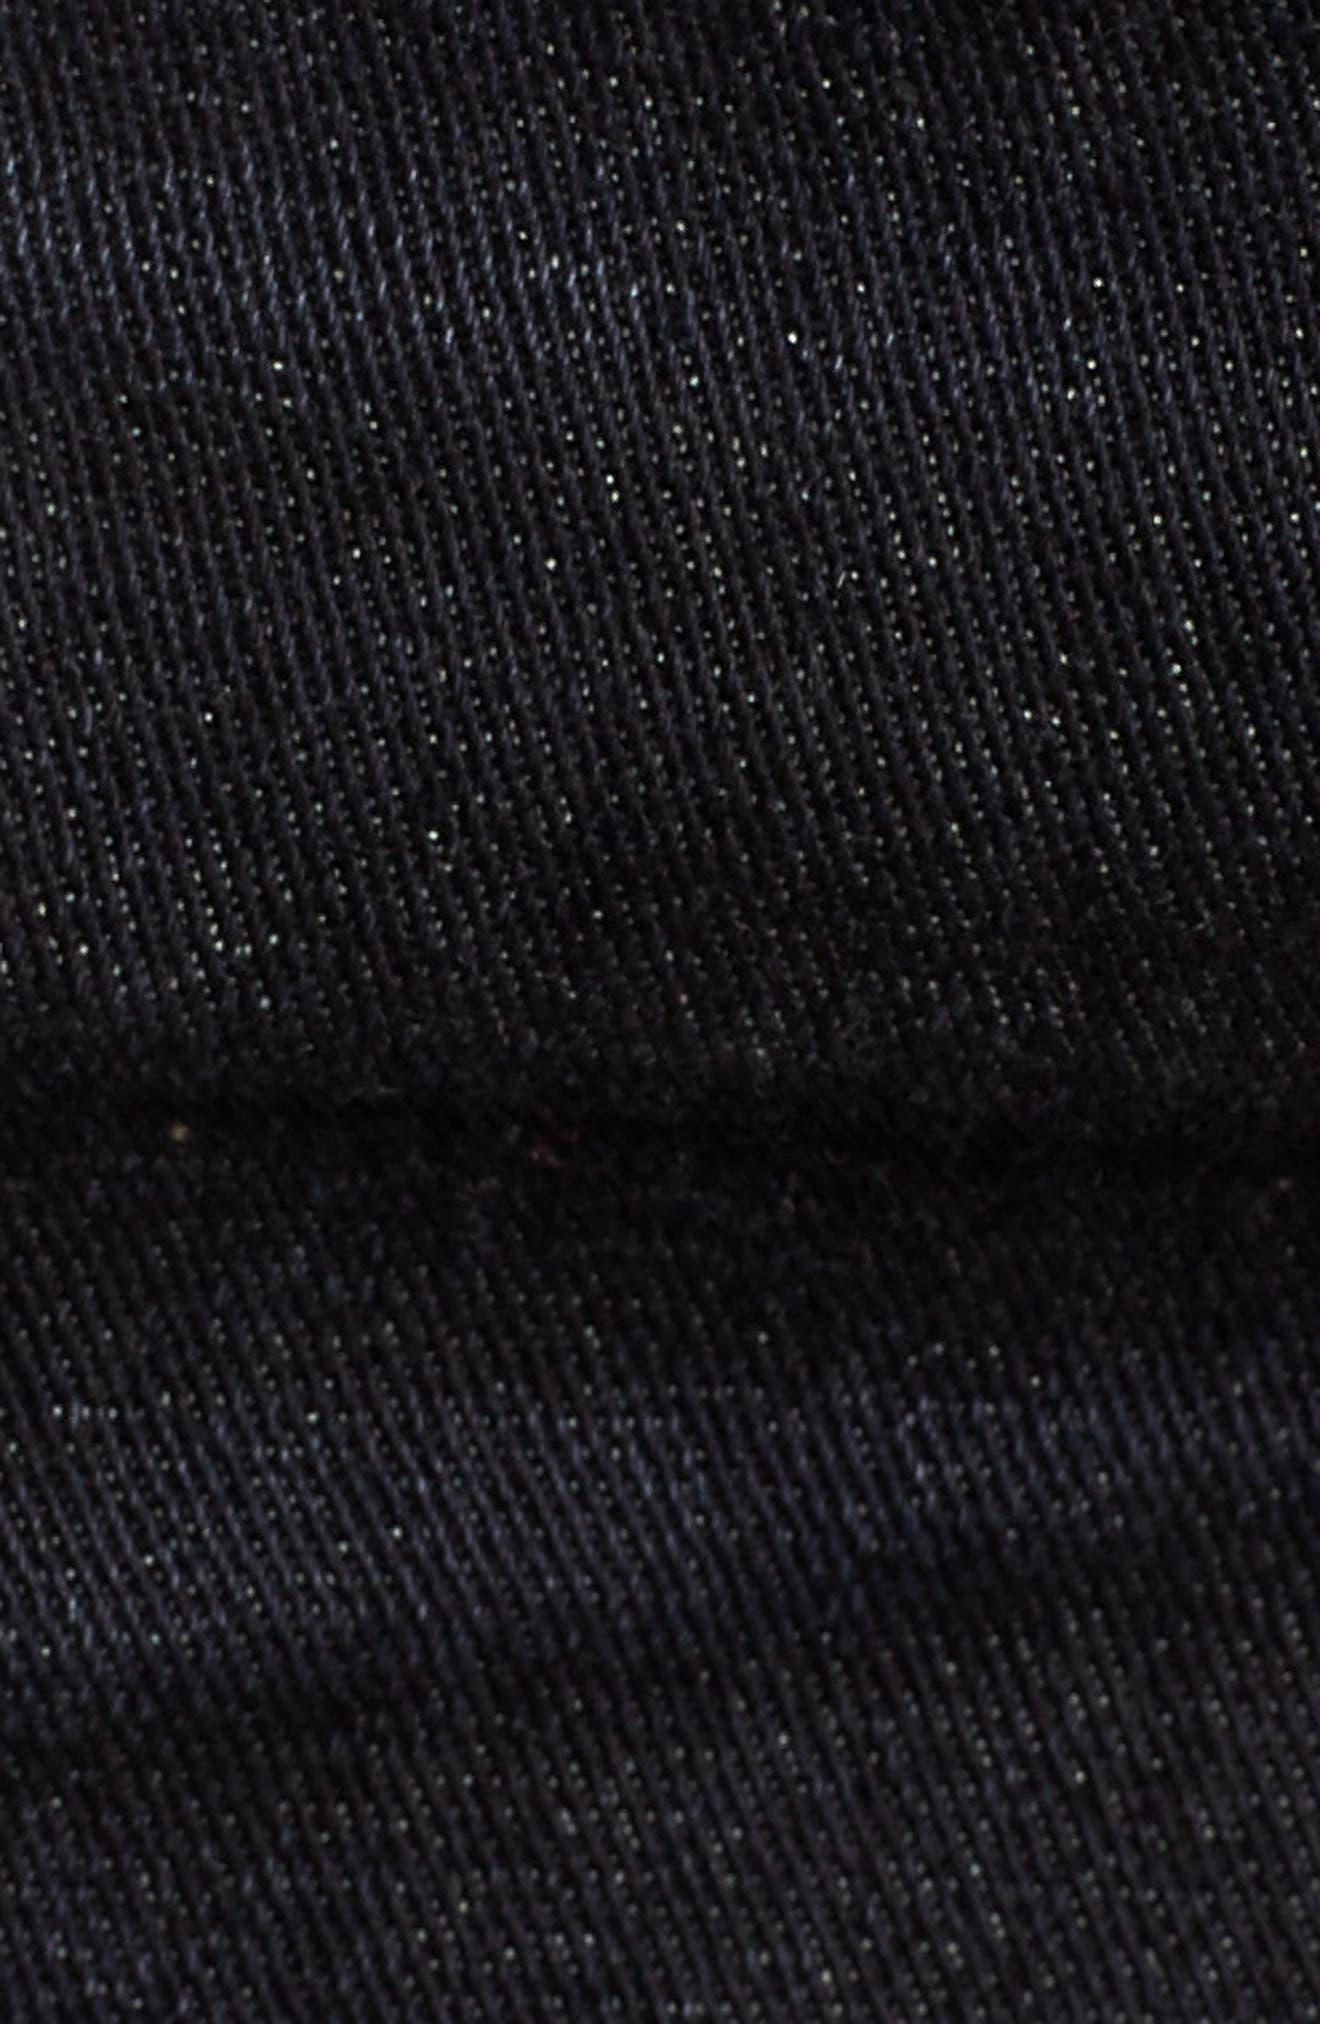 Zack Skinny Fit Jeans,                             Alternate thumbnail 5, color,                             001